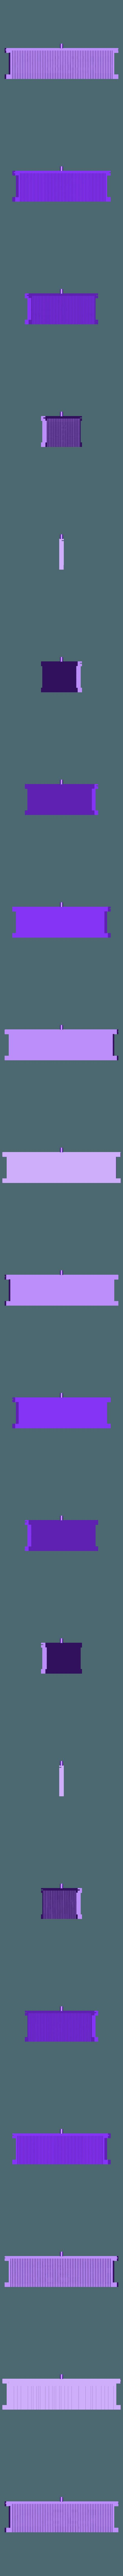 lat.STL Download free STL file # LIFEHACK3D-cajamuchiforma • Model to 3D print, izanferrco